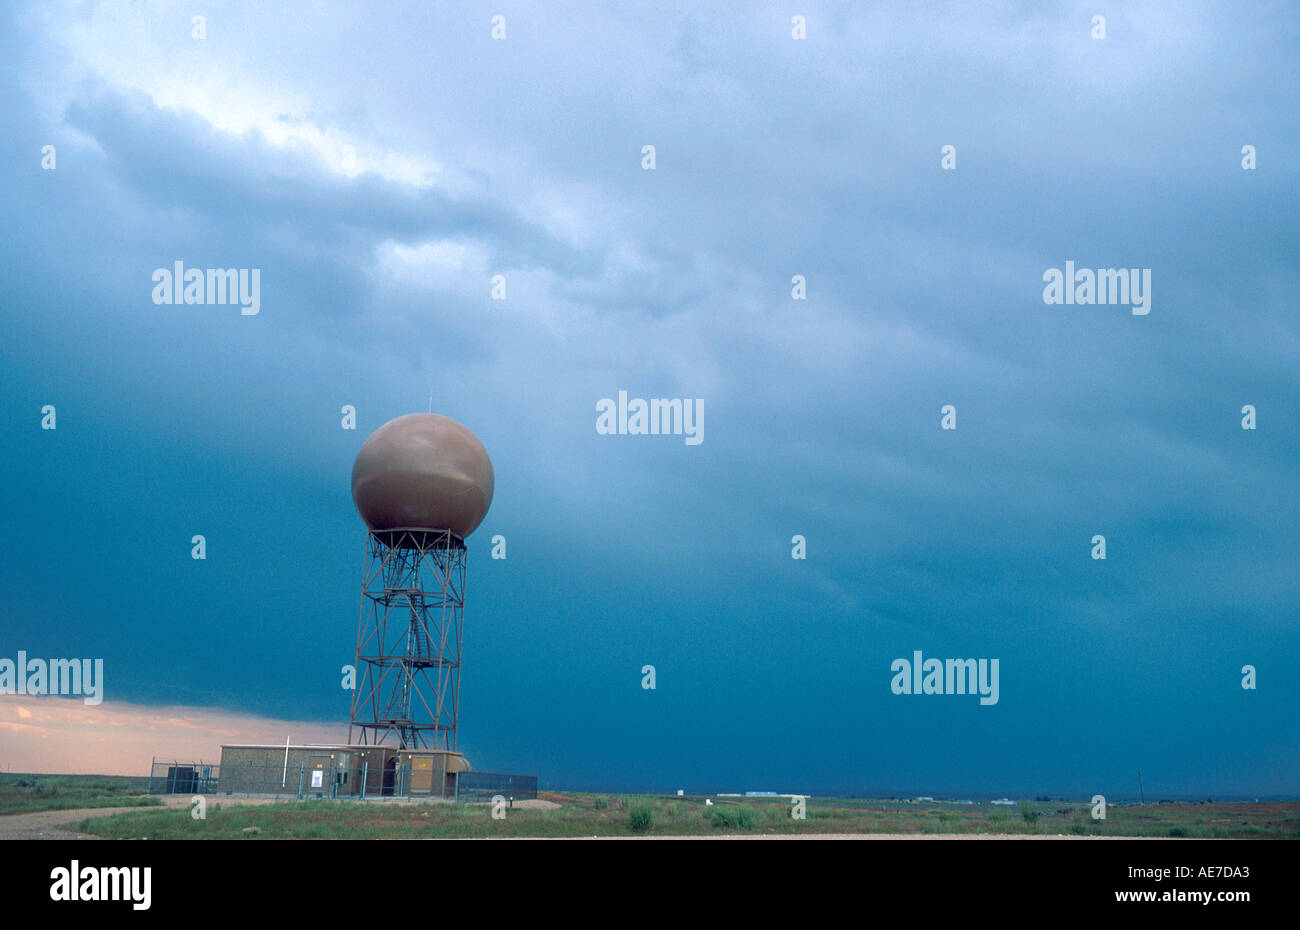 Doppler weather radar facility near Boise Idaho Stock Photo